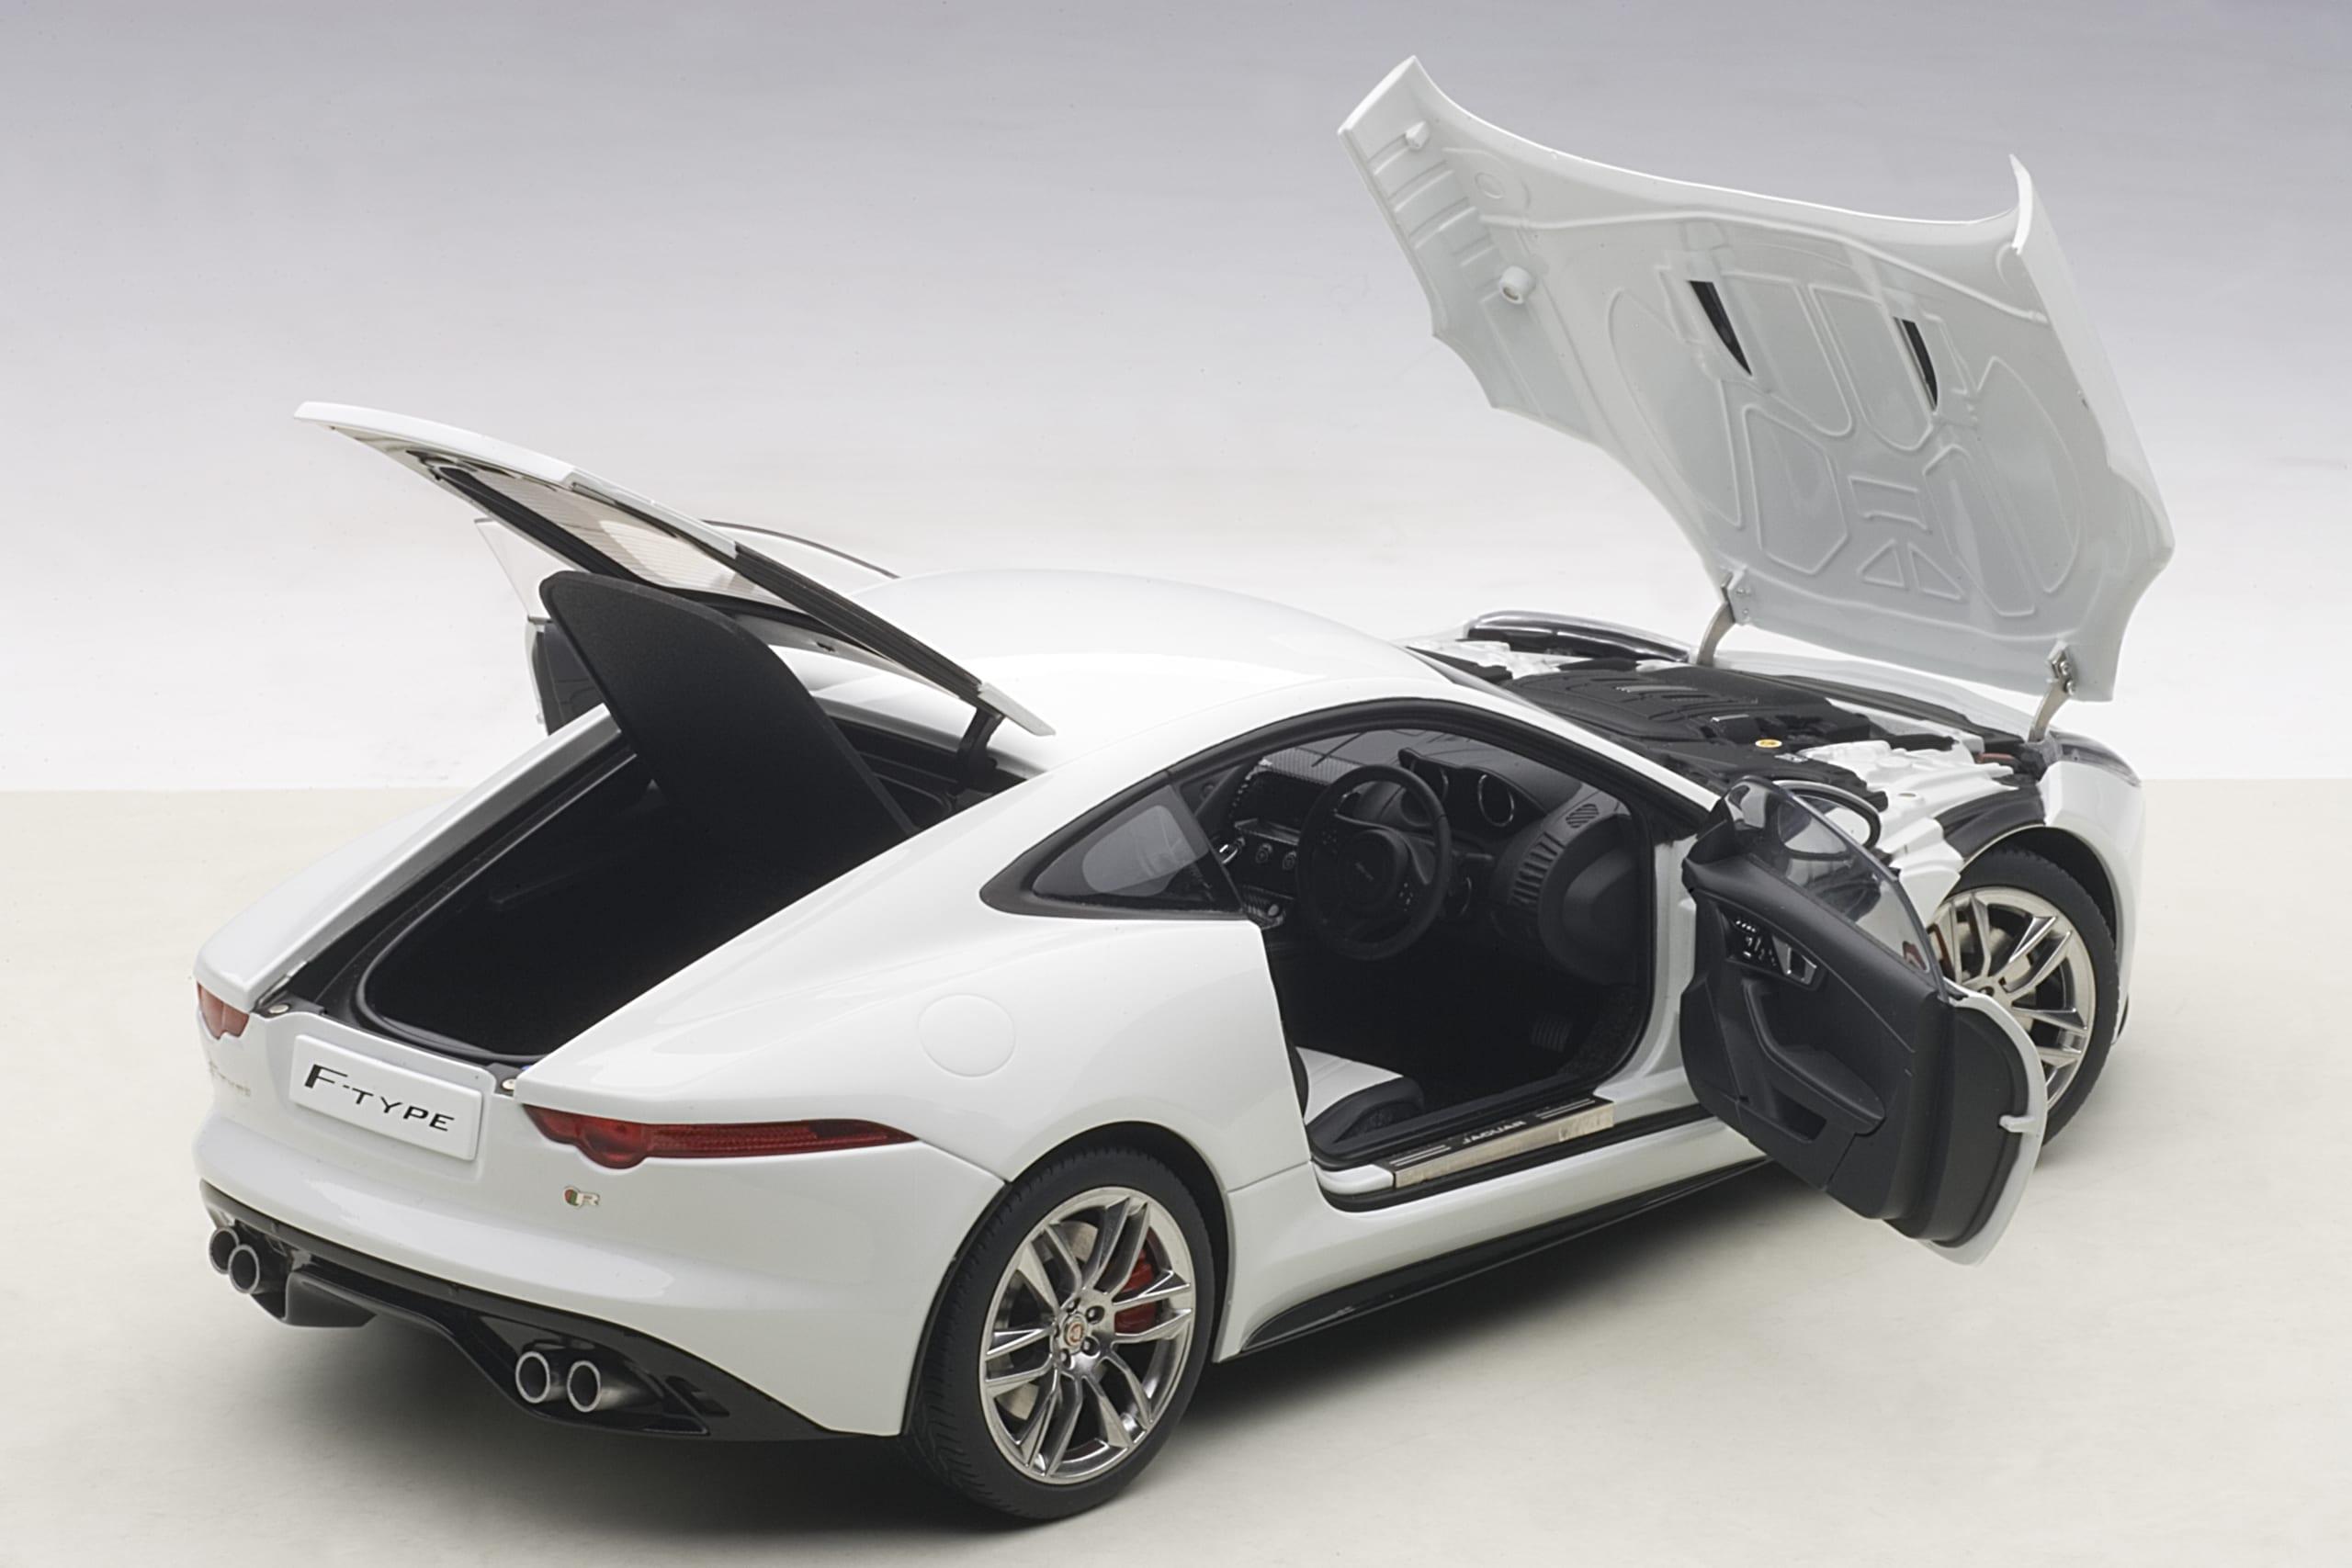 2015 Neu Autoart 73651-1//18 Jaguar F-Type R Coupe - Polaris White